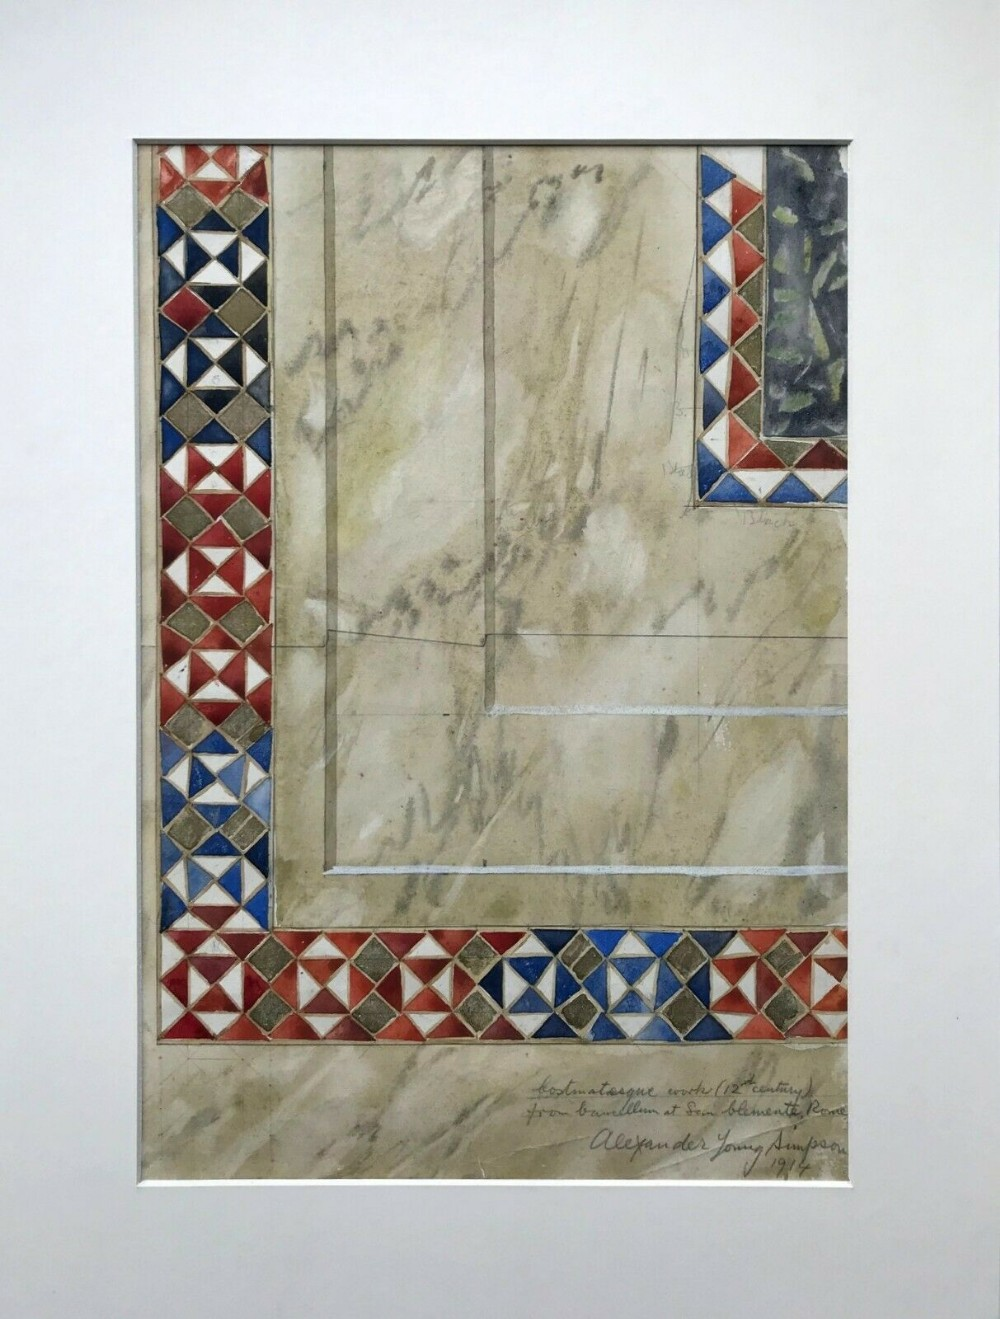 architecture study cosmatesque st clement rome italy original antique watercolour painting